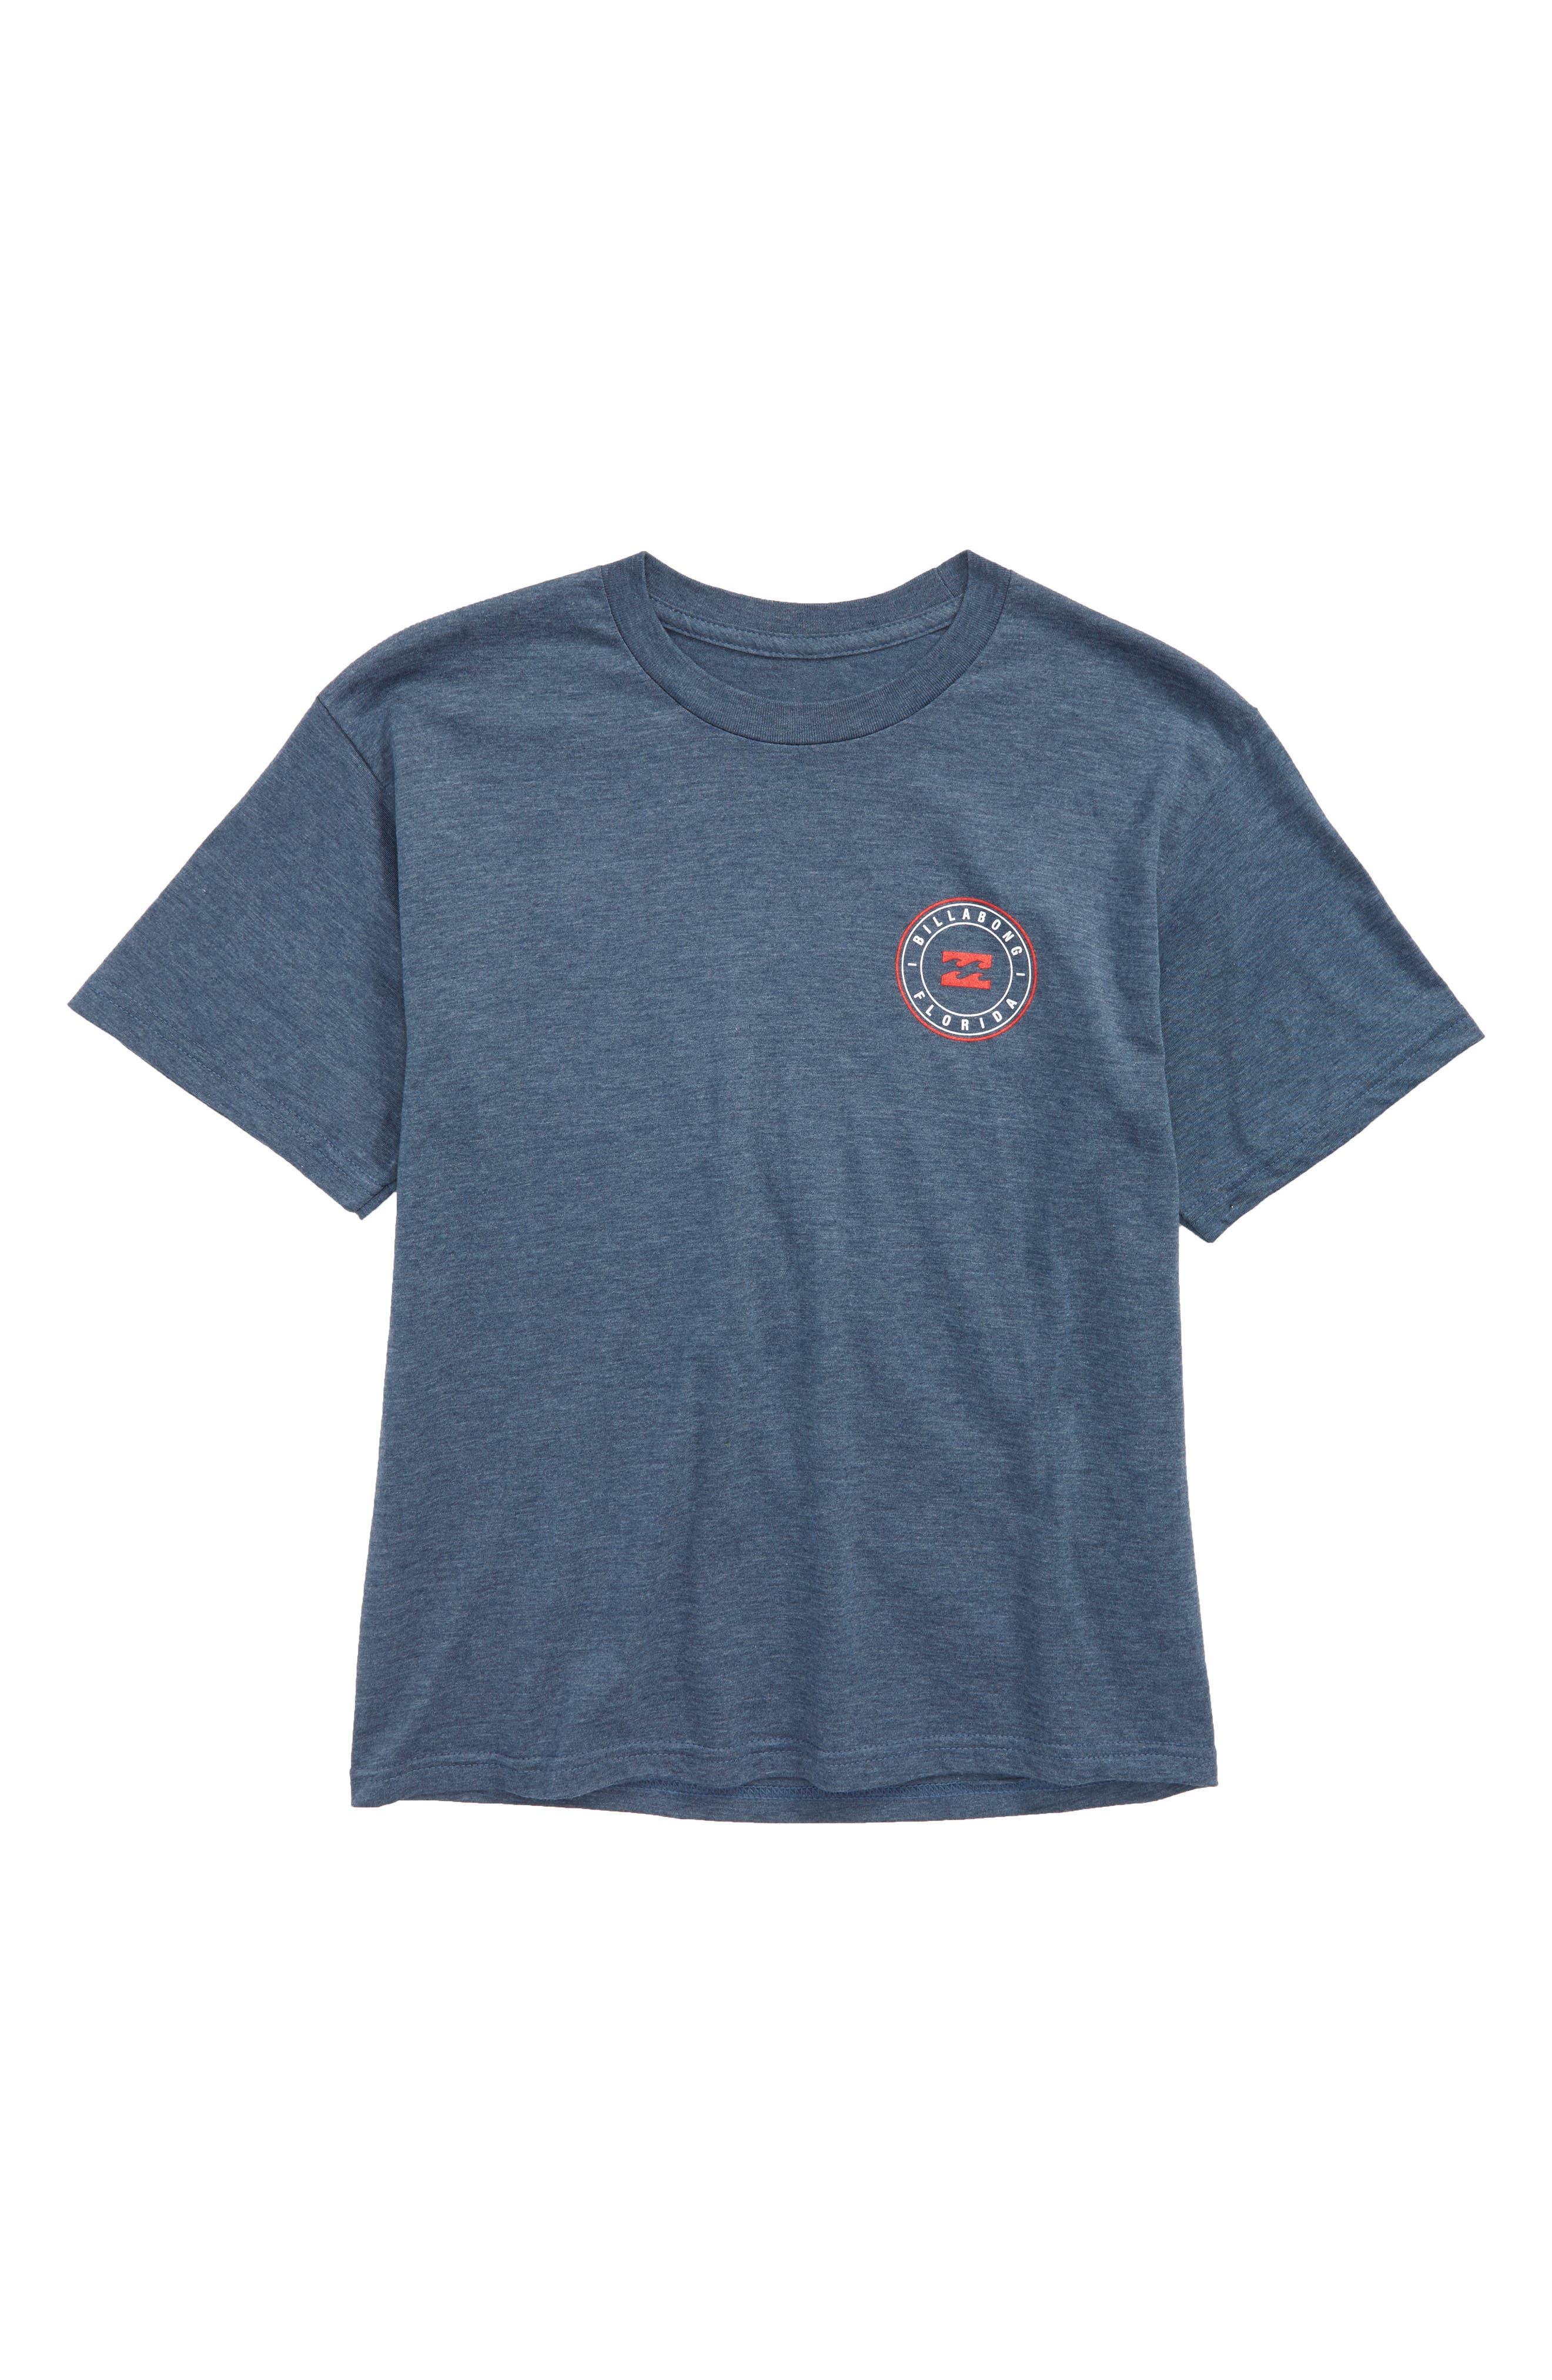 Native Rotor FL T-Shirt,                         Main,                         color, Denim Heather